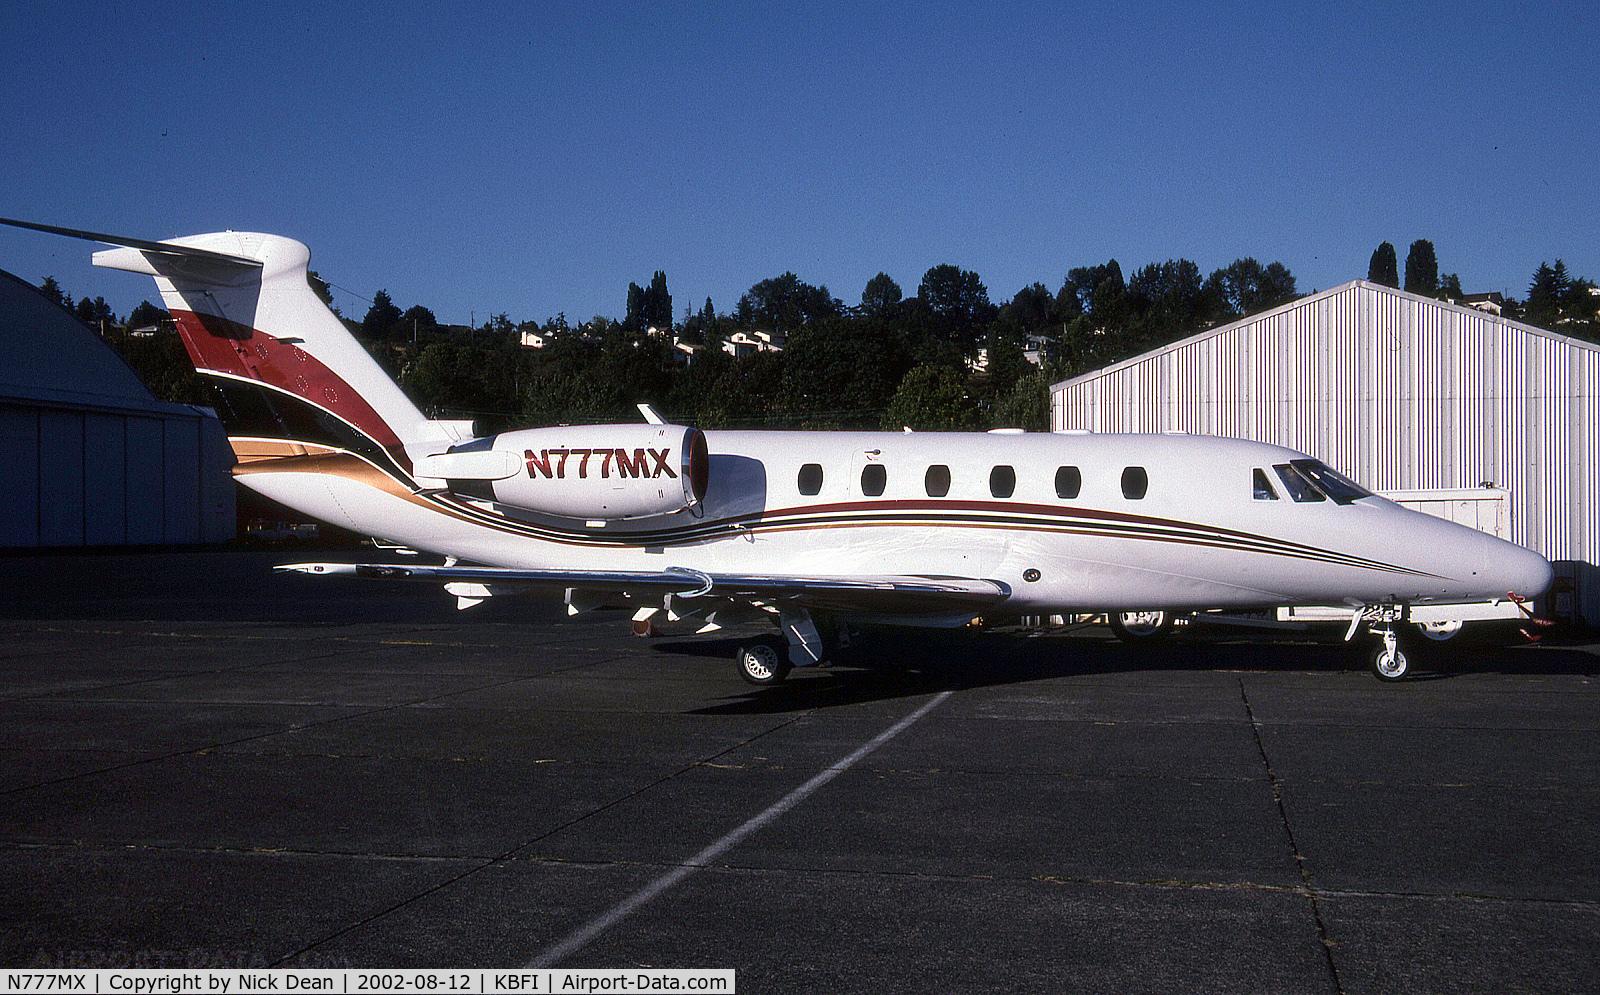 N777MX, 1984 Cessna 650 C/N 650-0051, KBFI